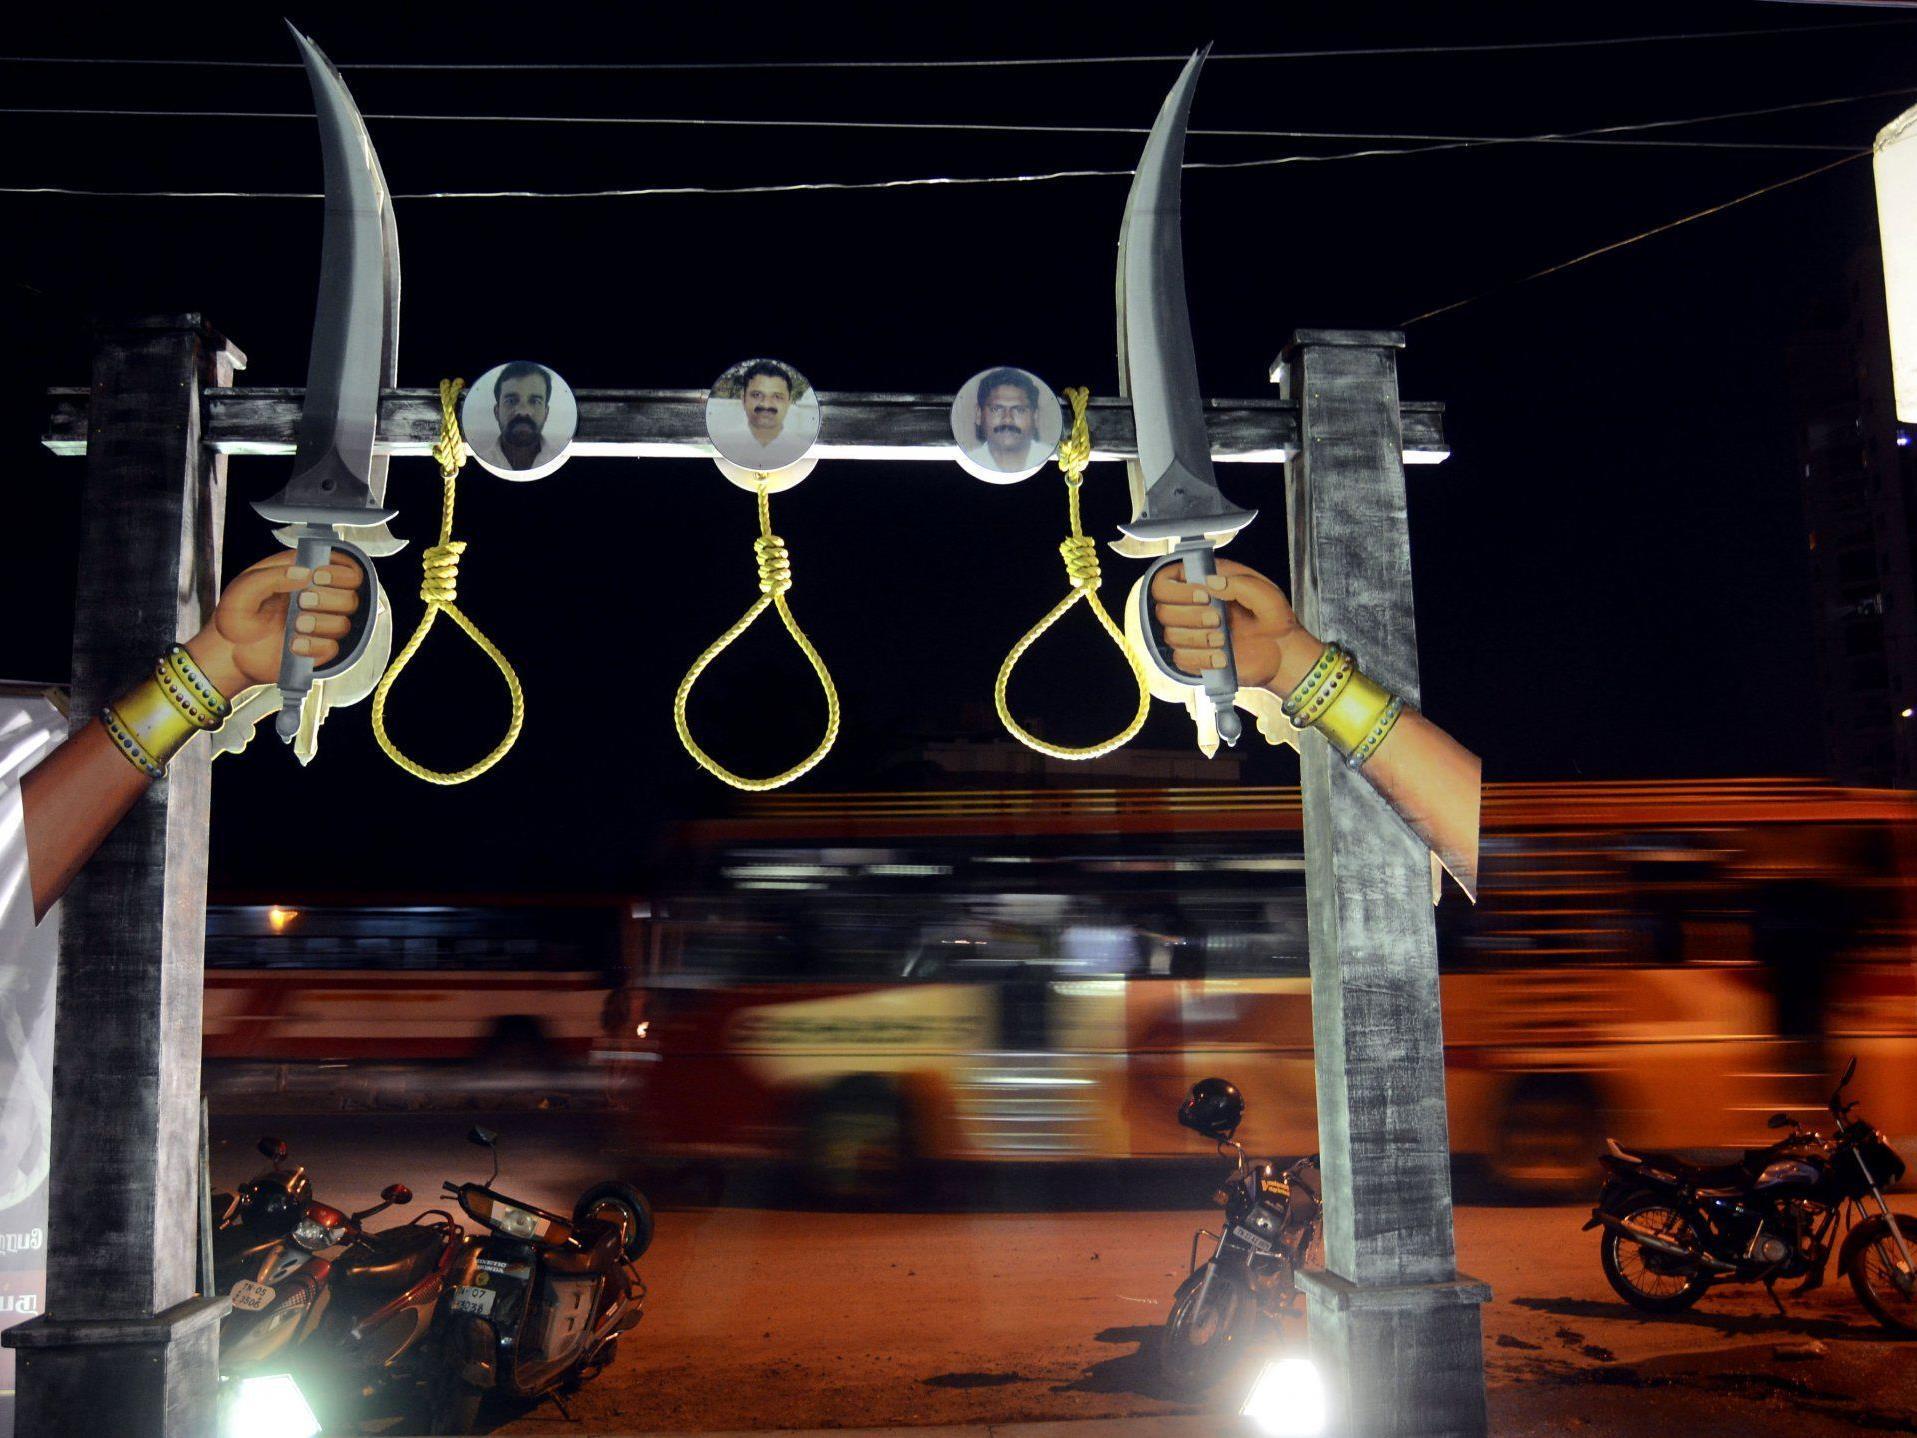 Proteste gegen die Todesstrafe in Indien.